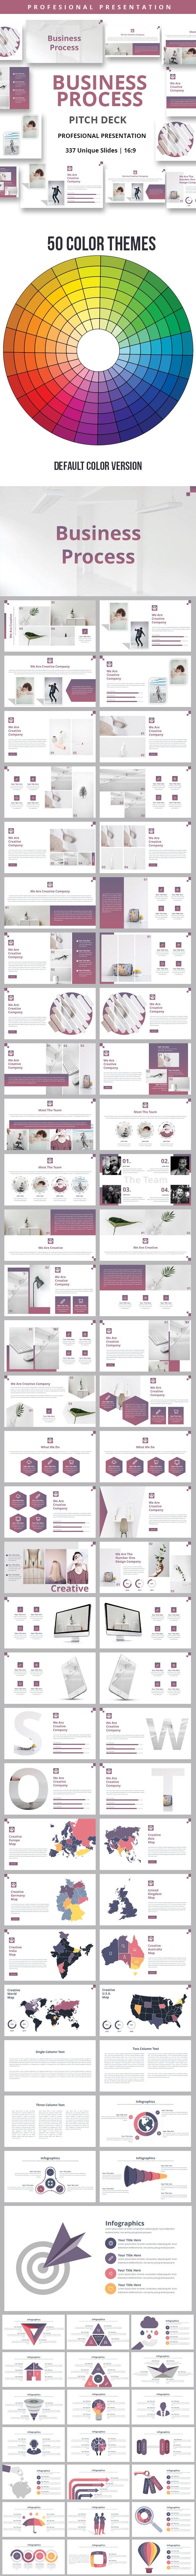 Business Process Powerpoint Presentation Template - Business PowerPoint Templates